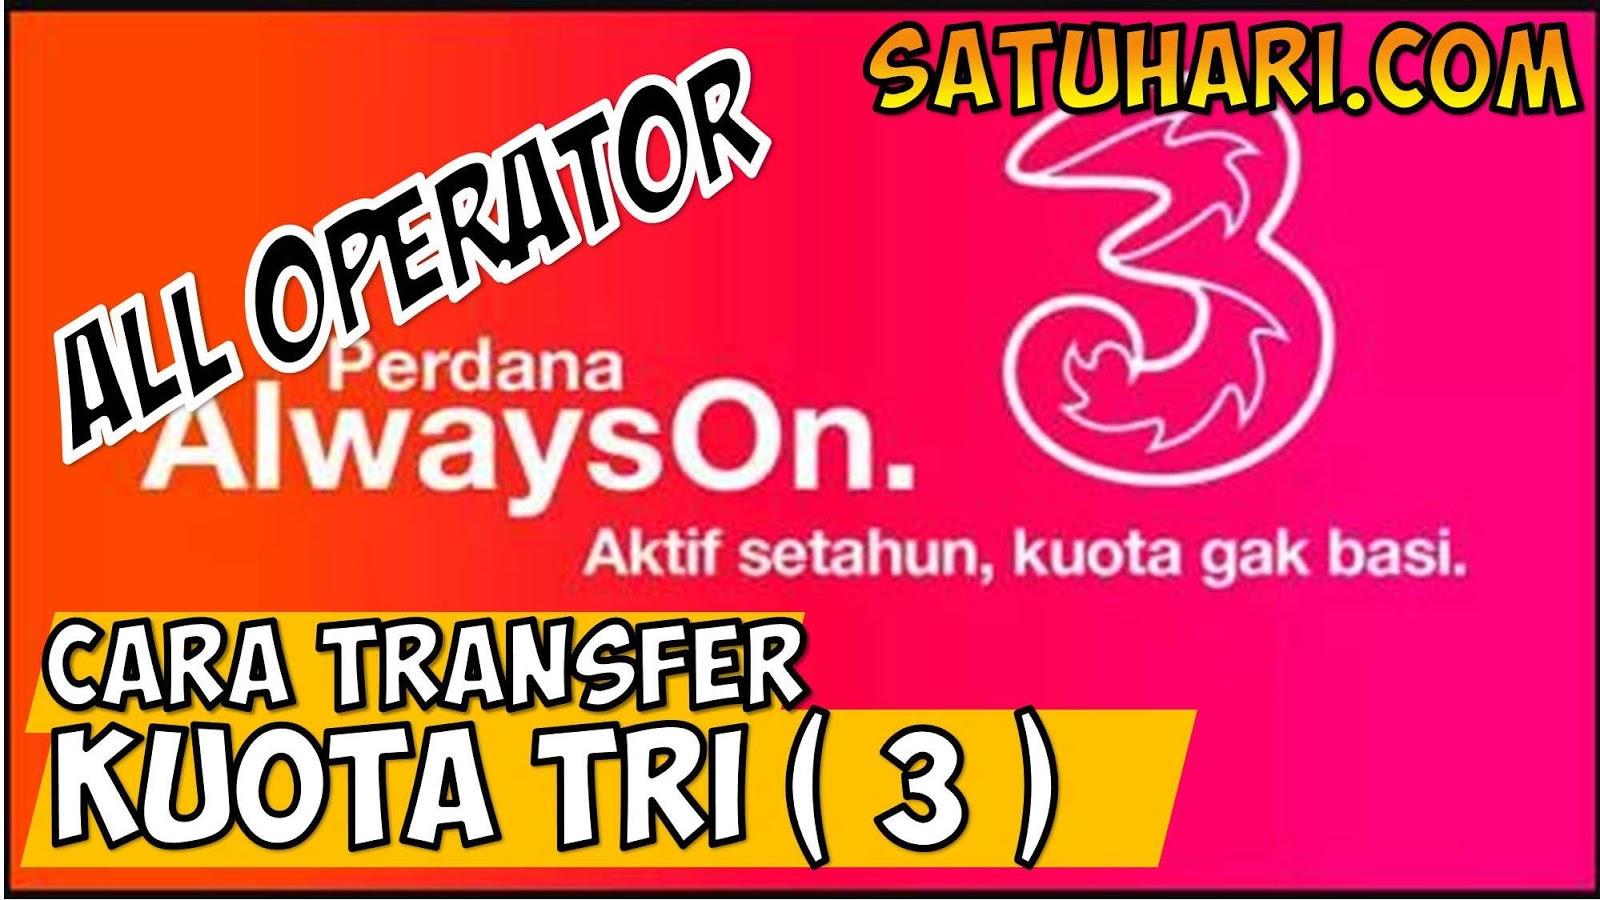 Transfer kuota indosat ooredoo transfer kuota indosat ke. √⊕ BARU- Cara Transfer Kuota Telkomsel Indosat 3 XL Axis ...